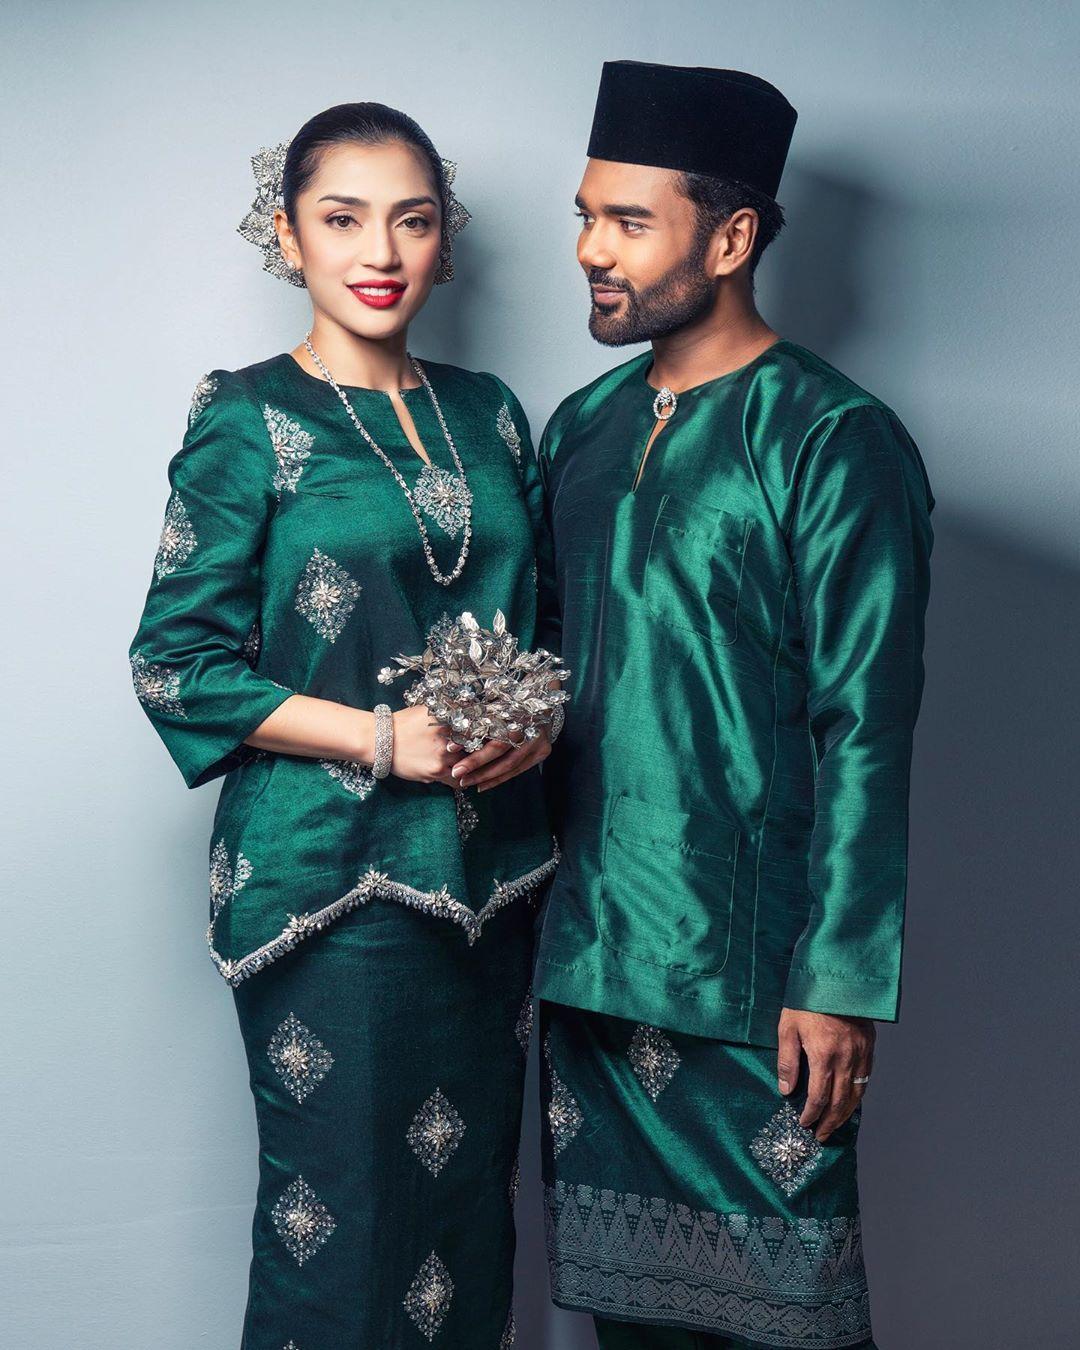 Pin By Sarah Shawtyy On Songket Wedding Dress Inspiration Songket Wedding Fashion